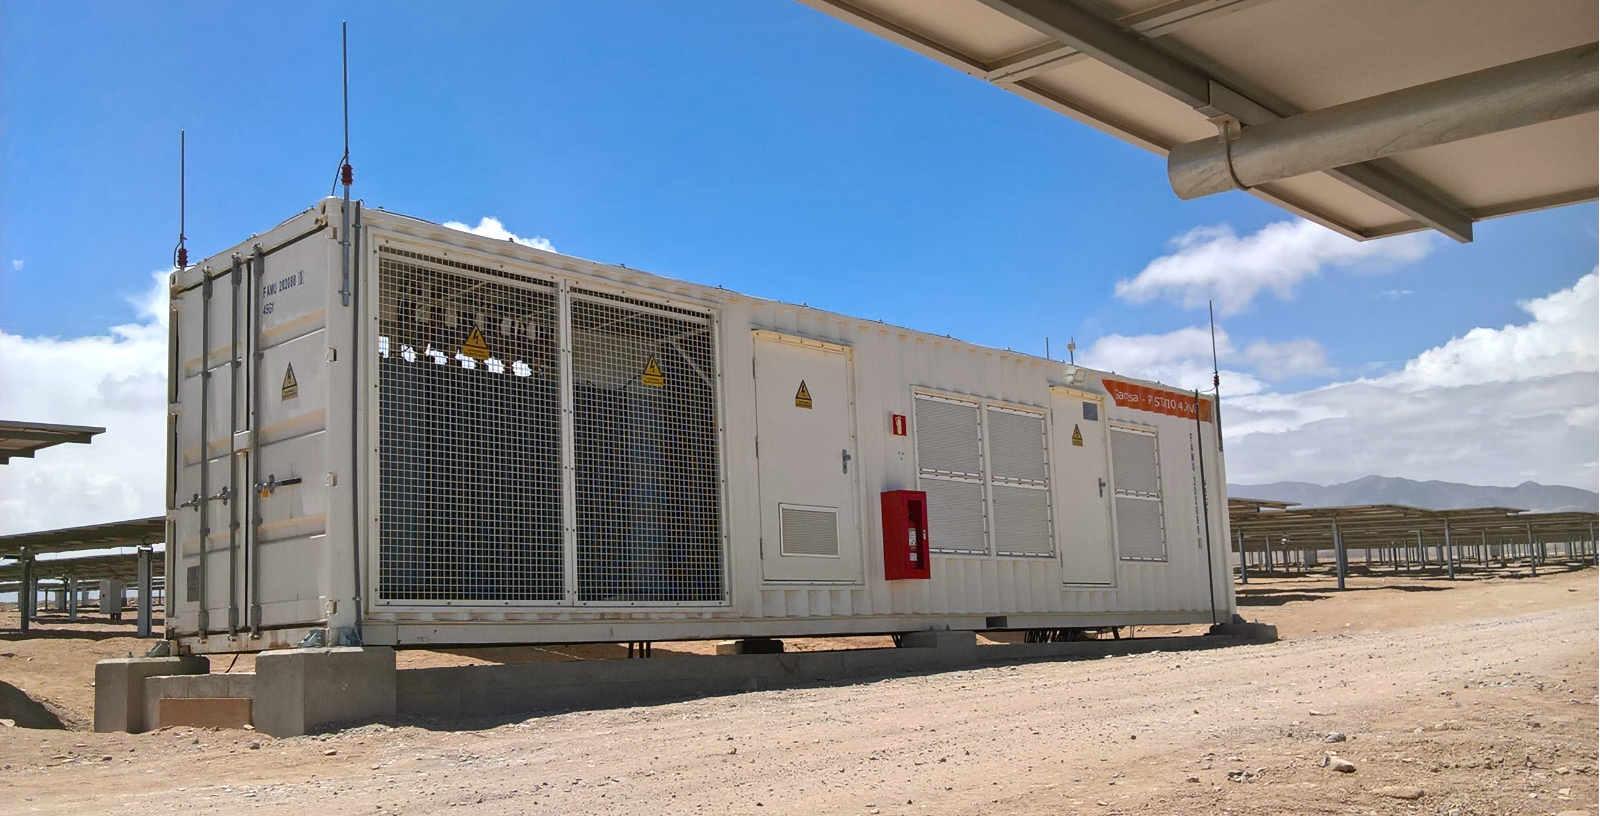 Intipampa_PV_Photovoltaic_Plant_Per__Engie_IDOM_2_1